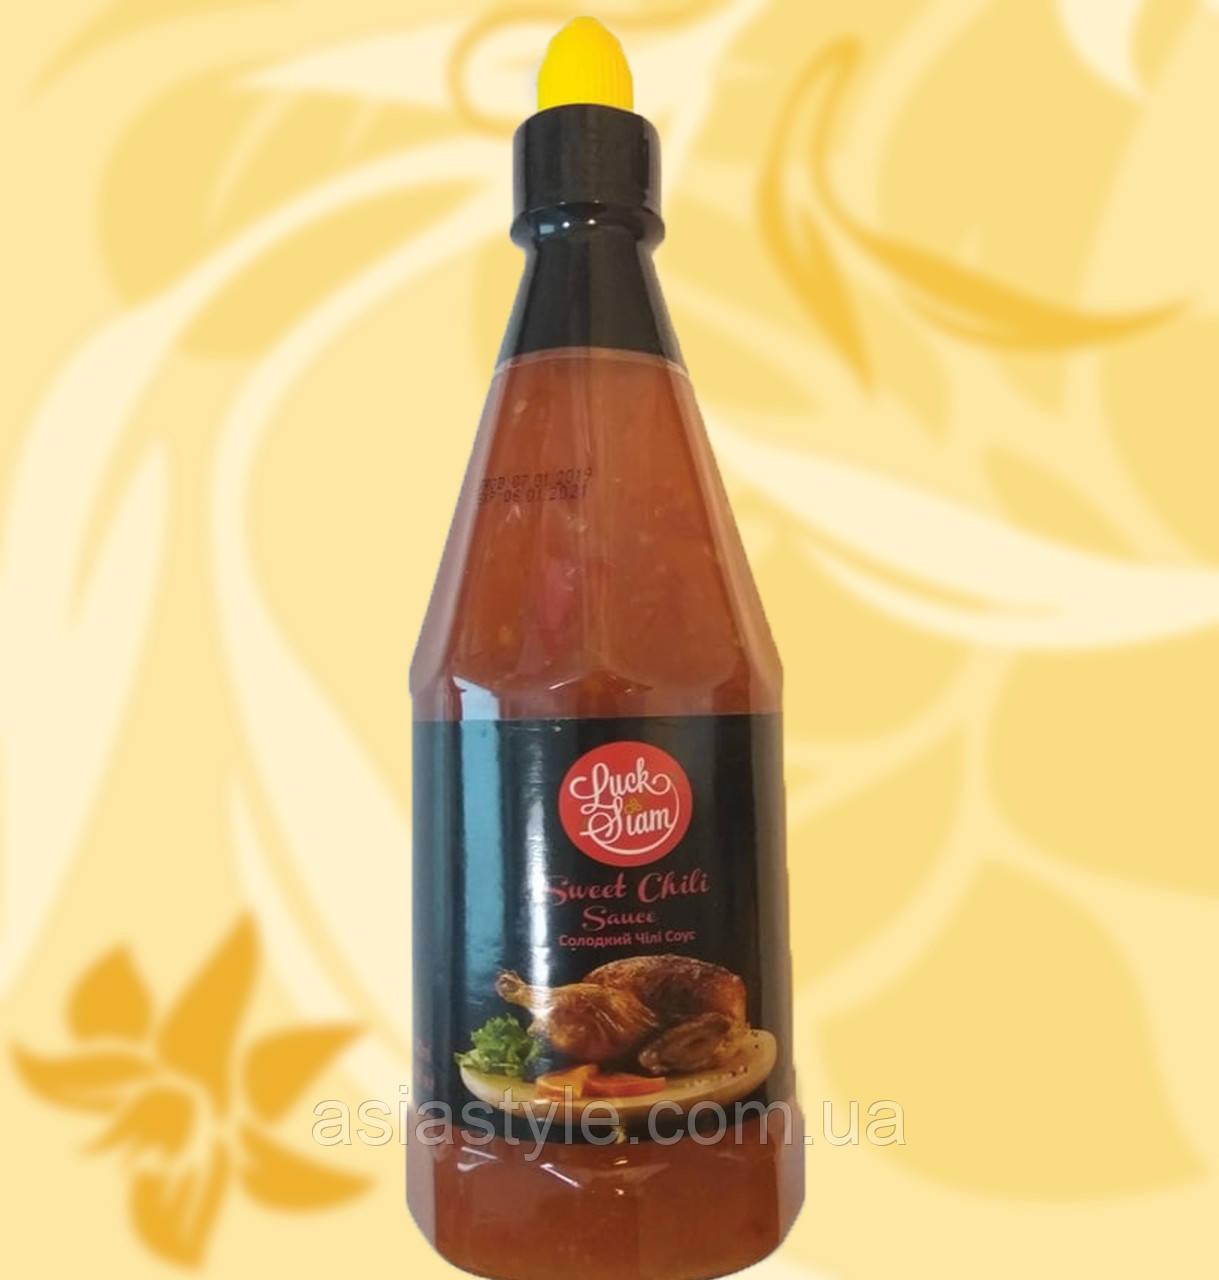 Солодкий чилі соус, Sweet Chili Sauce, Luck Siam, 740 г, РоШм